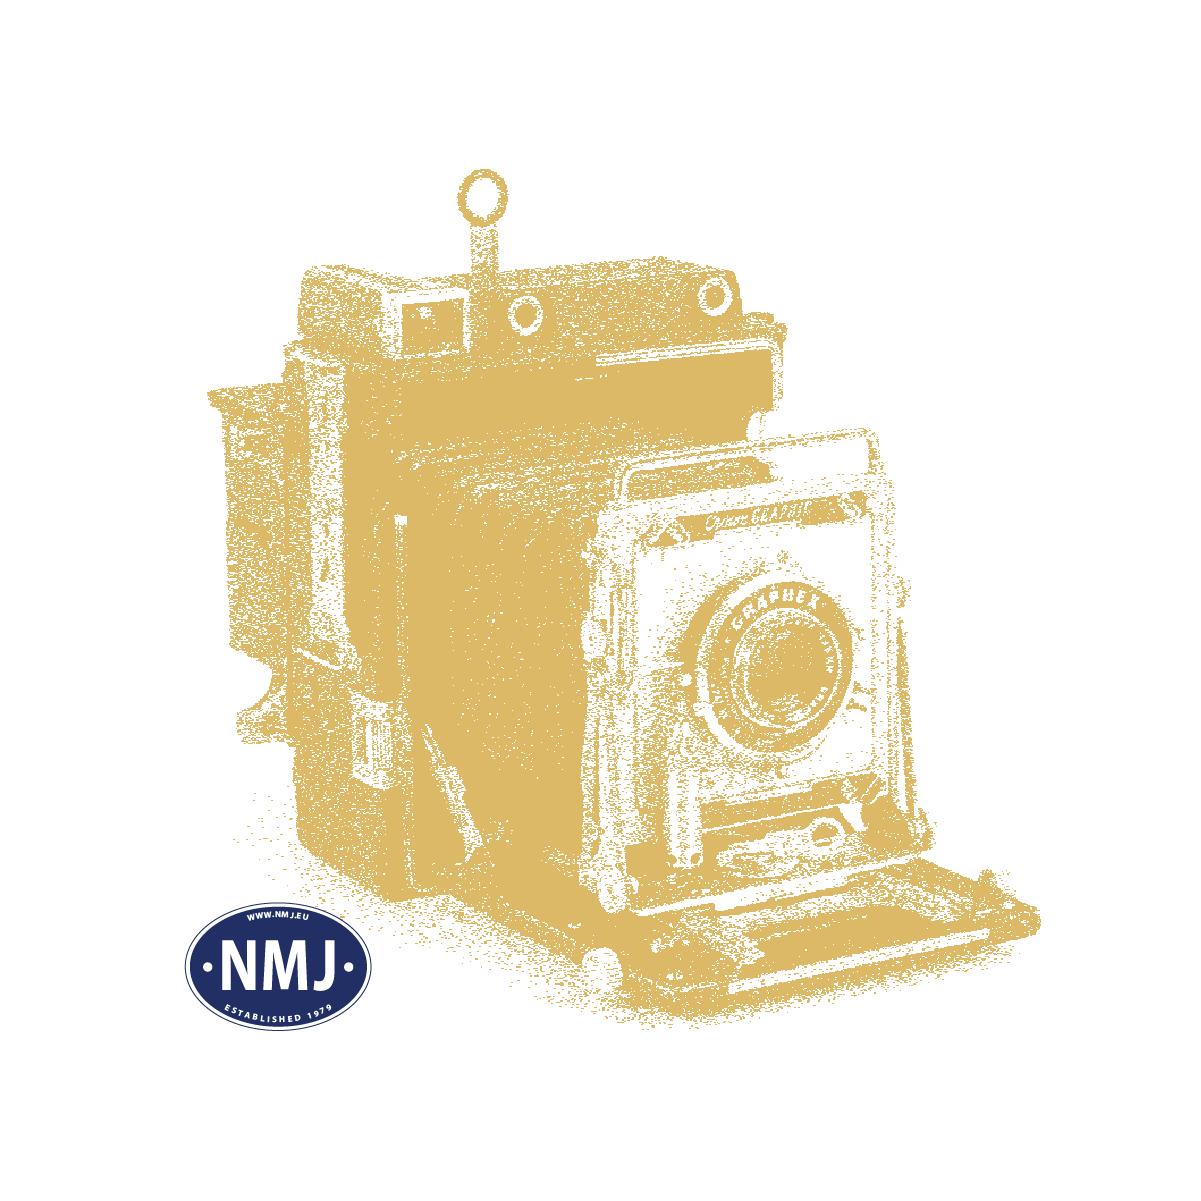 NOC15472 - Reisegruppe